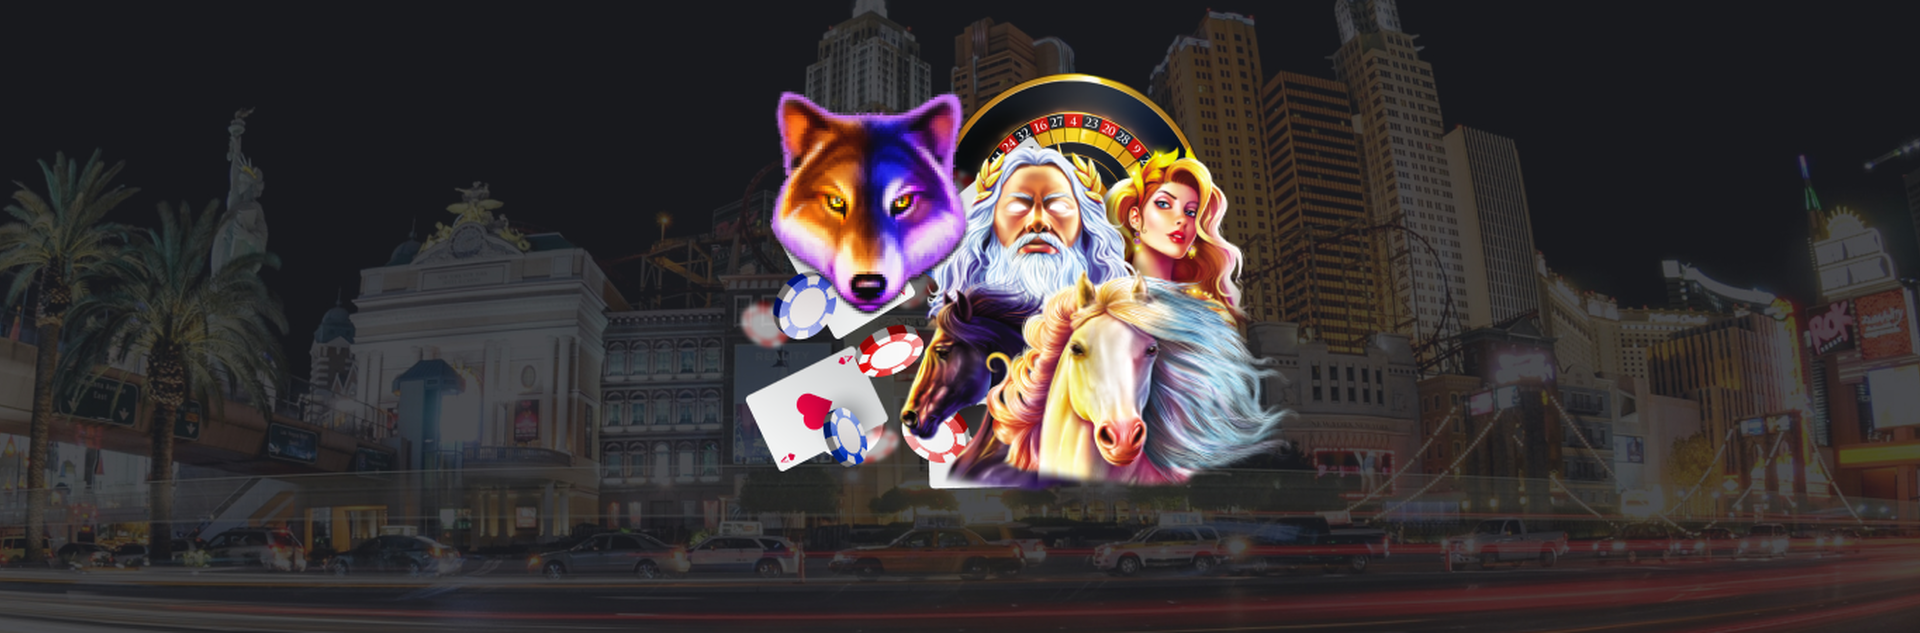 Unikrn casino review CA